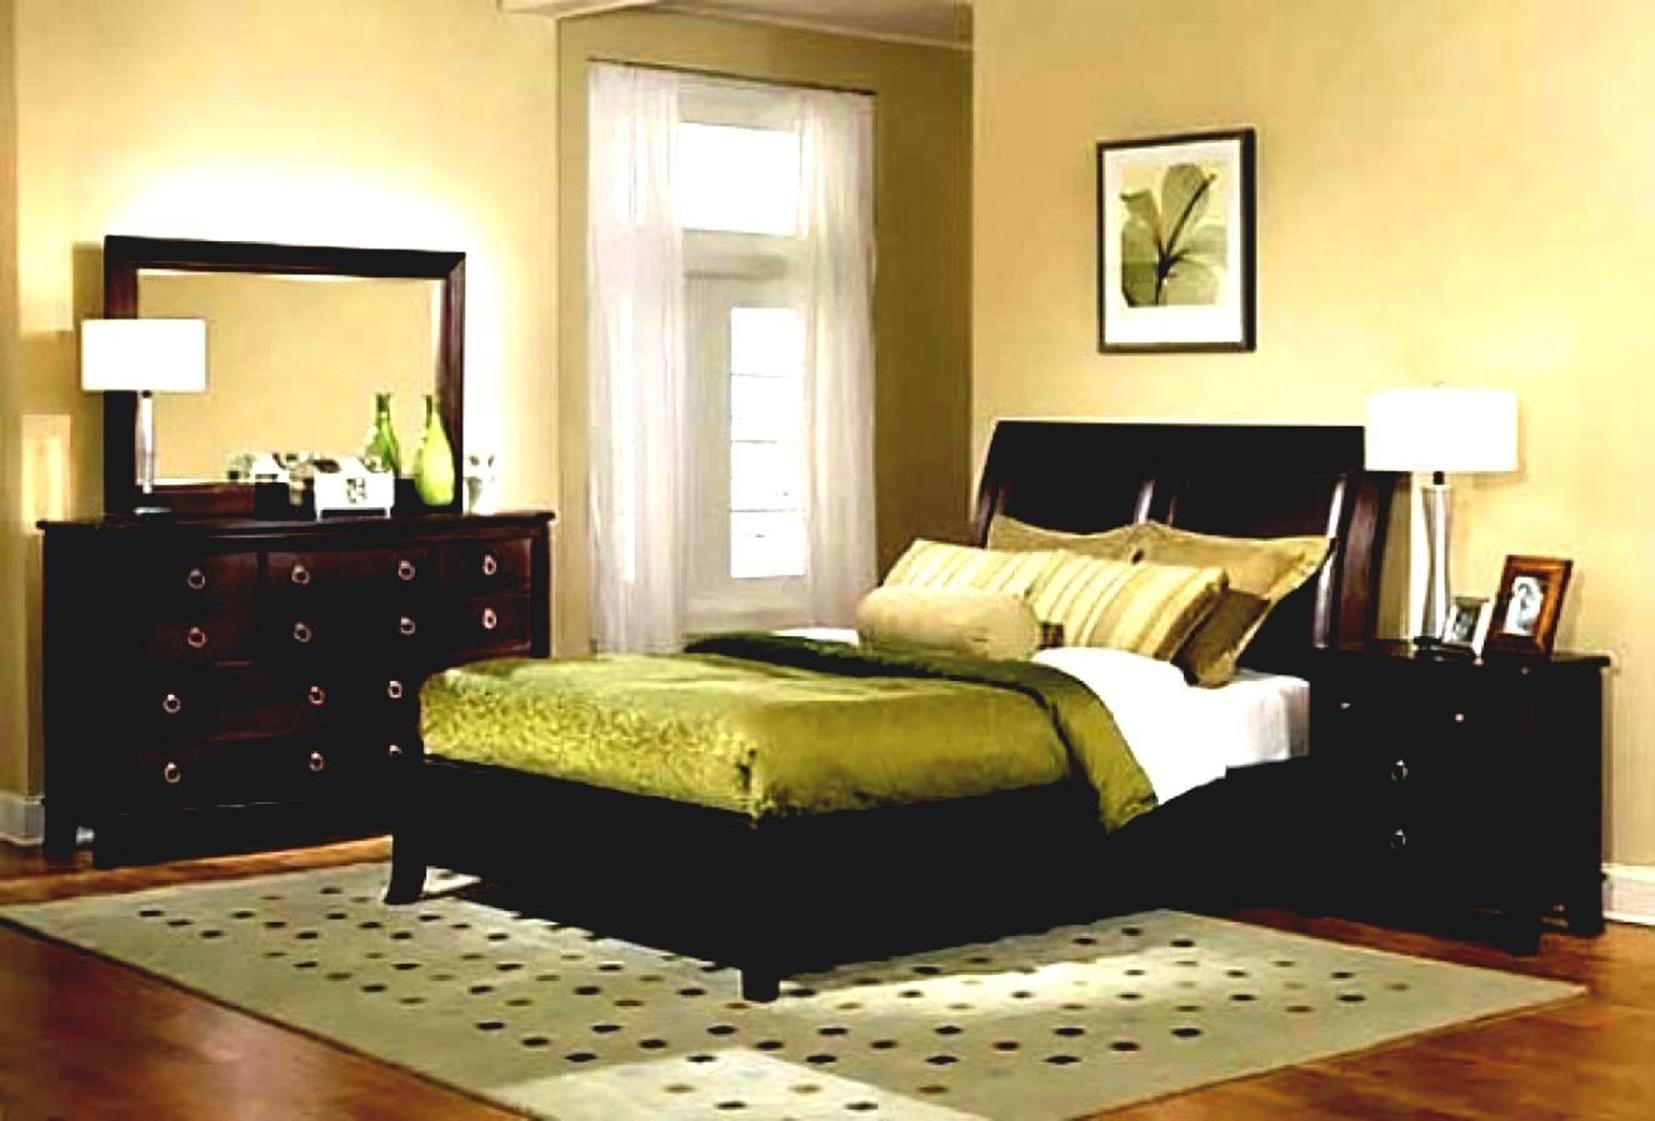 40+ Perfect Modern Neutral Bedroom Paint Colors Ideas | Pinterest ...